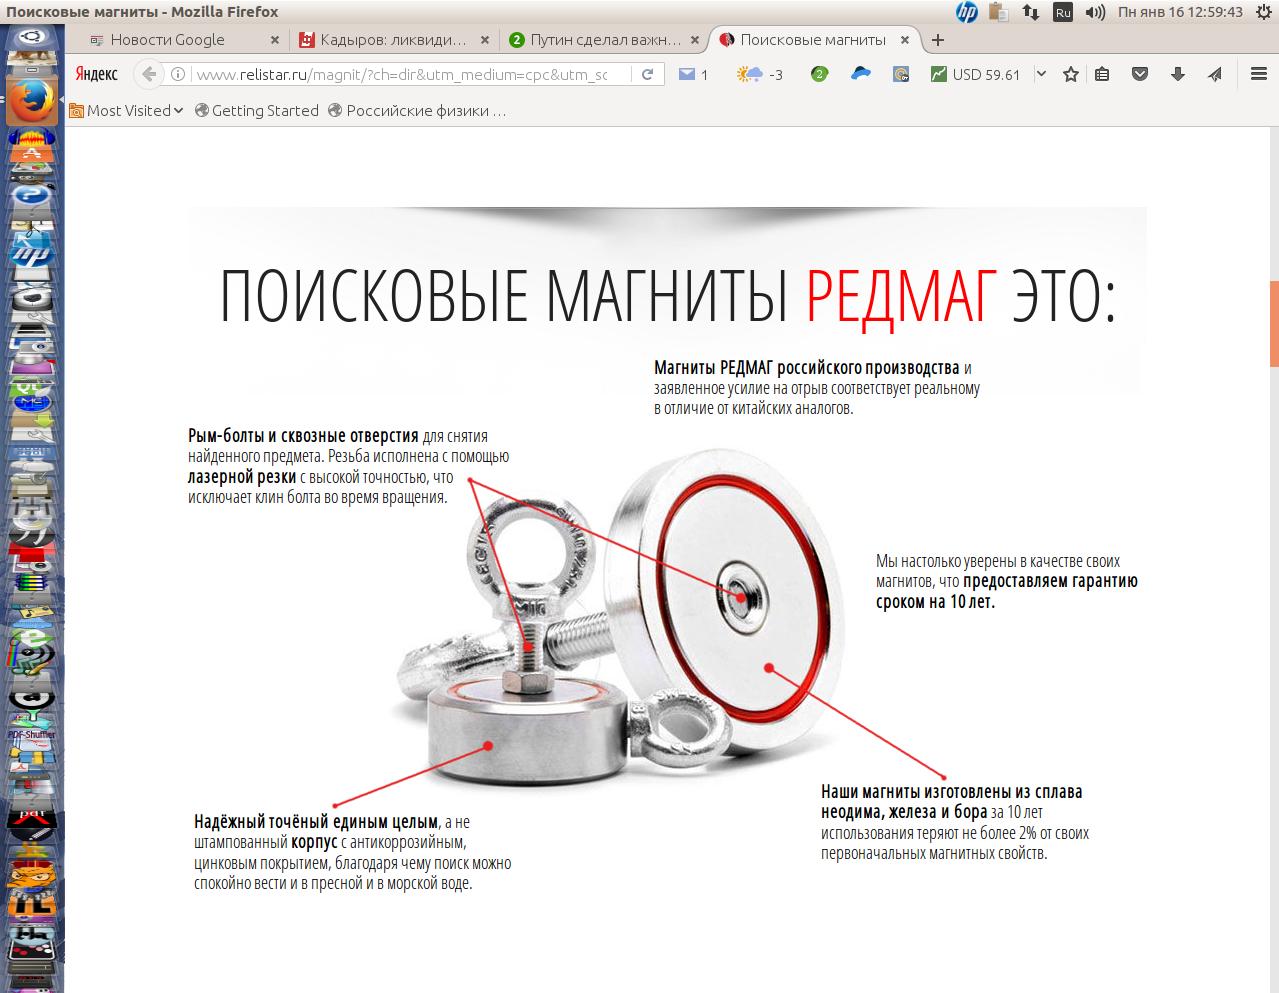 http://i5.imageban.ru/out/2017/01/16/ed59c335fdf8a7c3e648b6f687745b2f.png